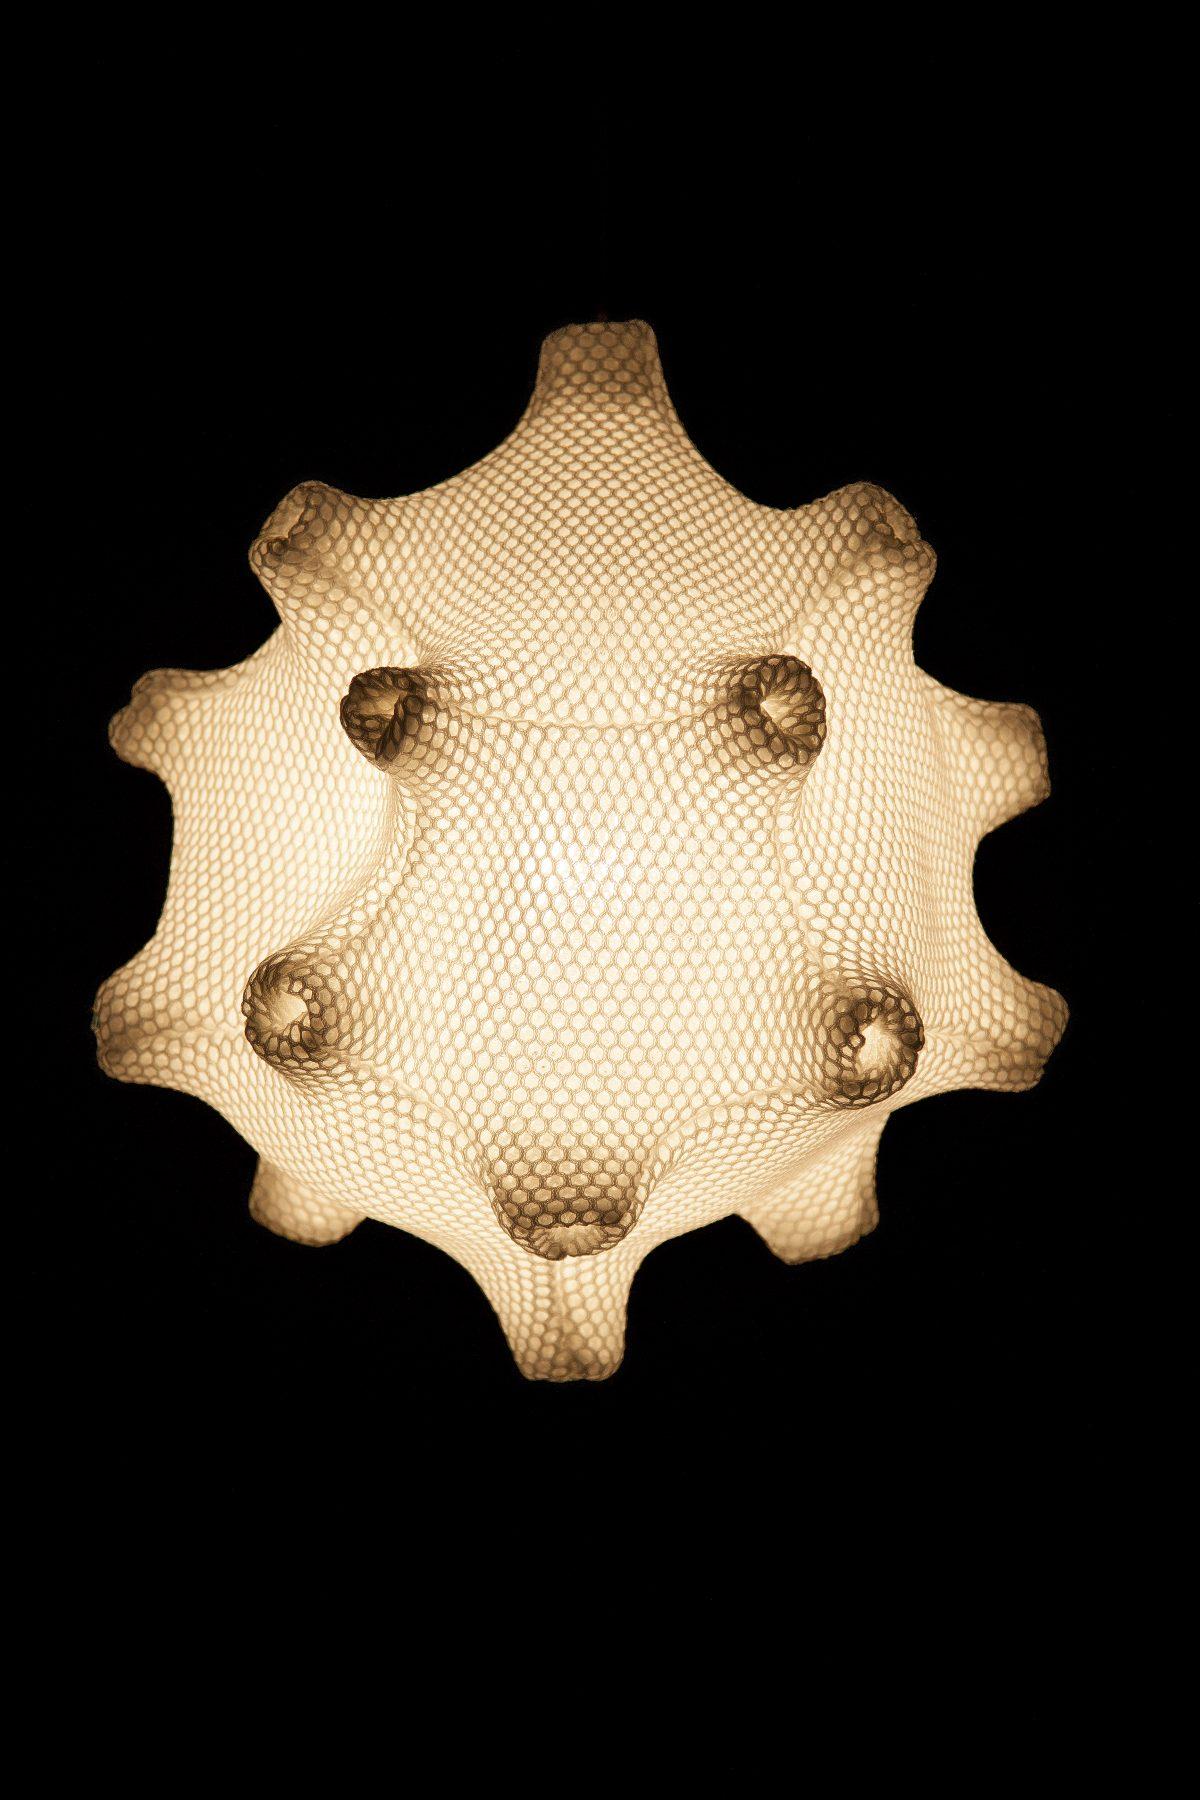 Radiolaria Tentaculus Giganticus hanglamp van Bernotat